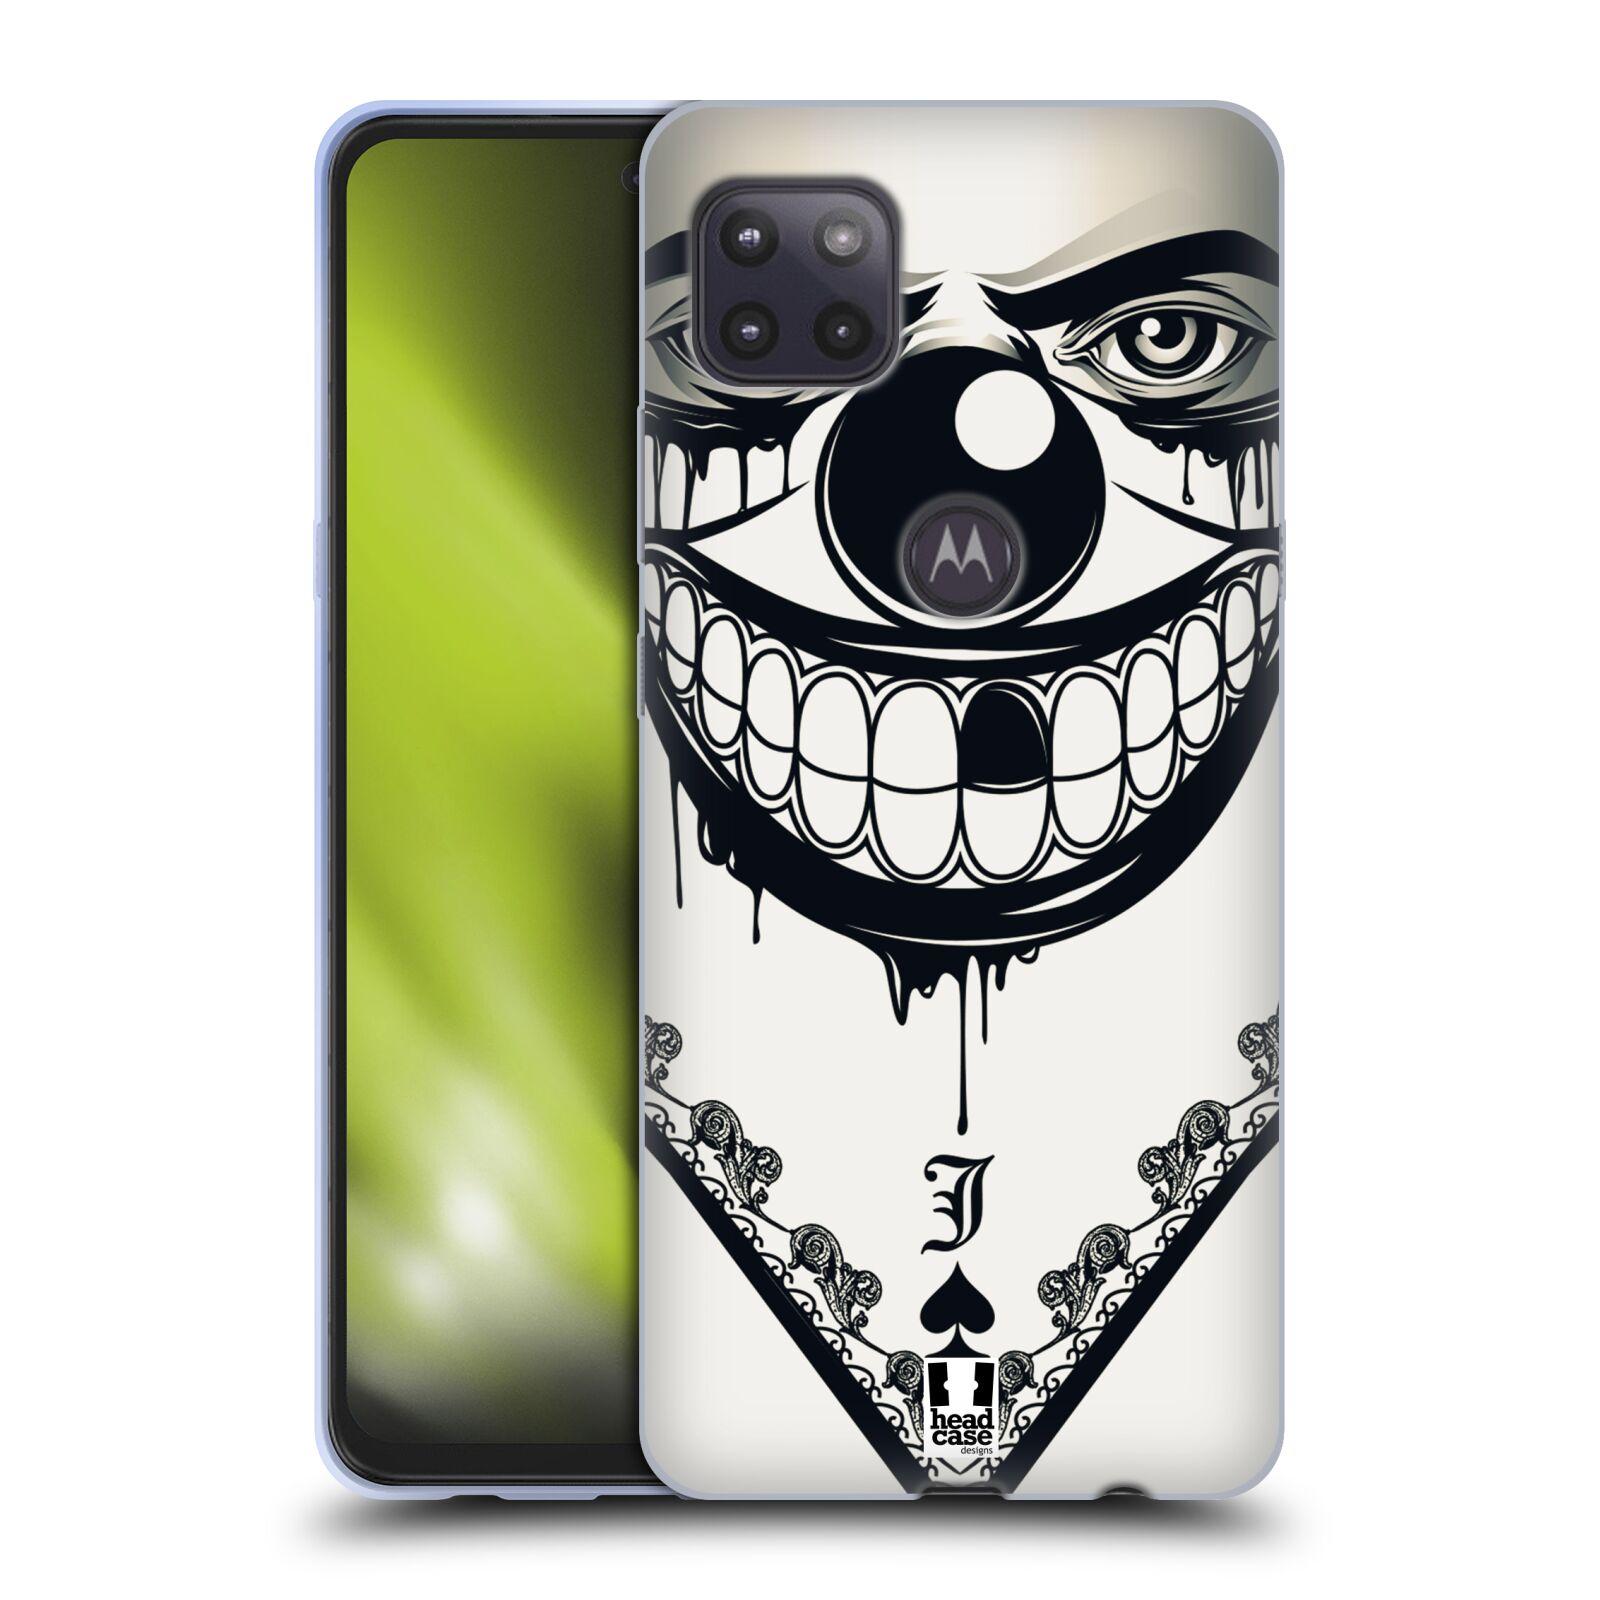 Silikonové pouzdro na mobil Motorola Moto G 5G - Head Case - ZLEJ KLAUN